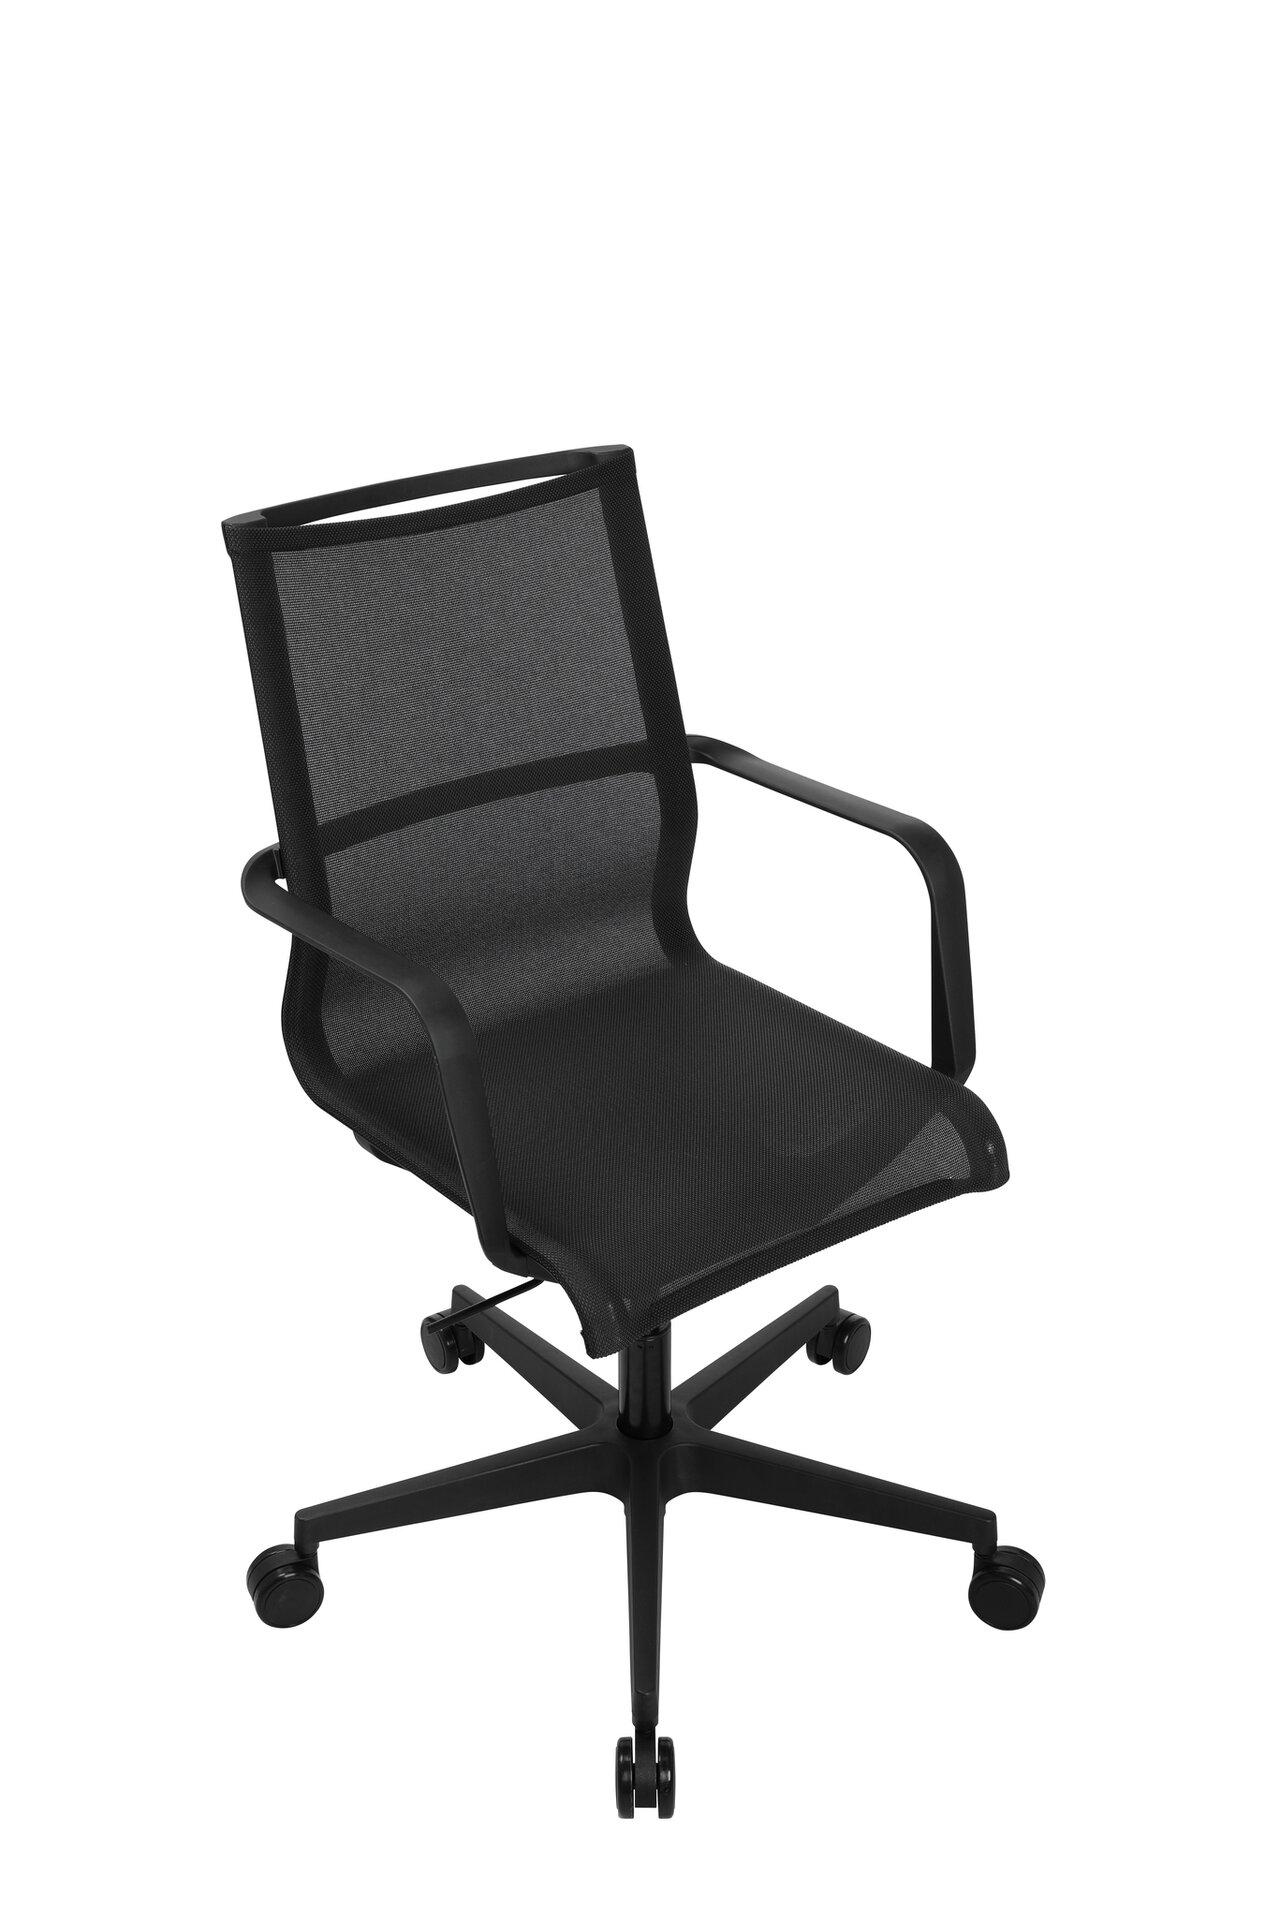 Büro-Drehstuhl SITNESS LIFE 40 Topstar Textil schwarz 54 x 104 x 58 cm